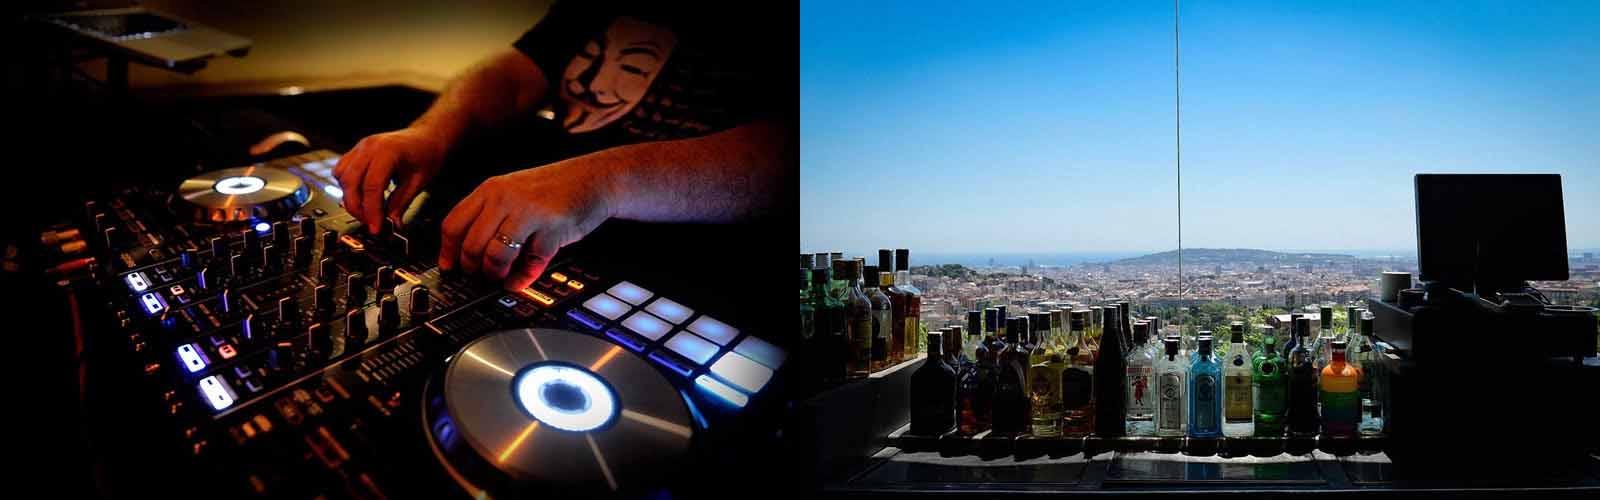 Enjoy the view of Barcelona at Nightclub Mirablau